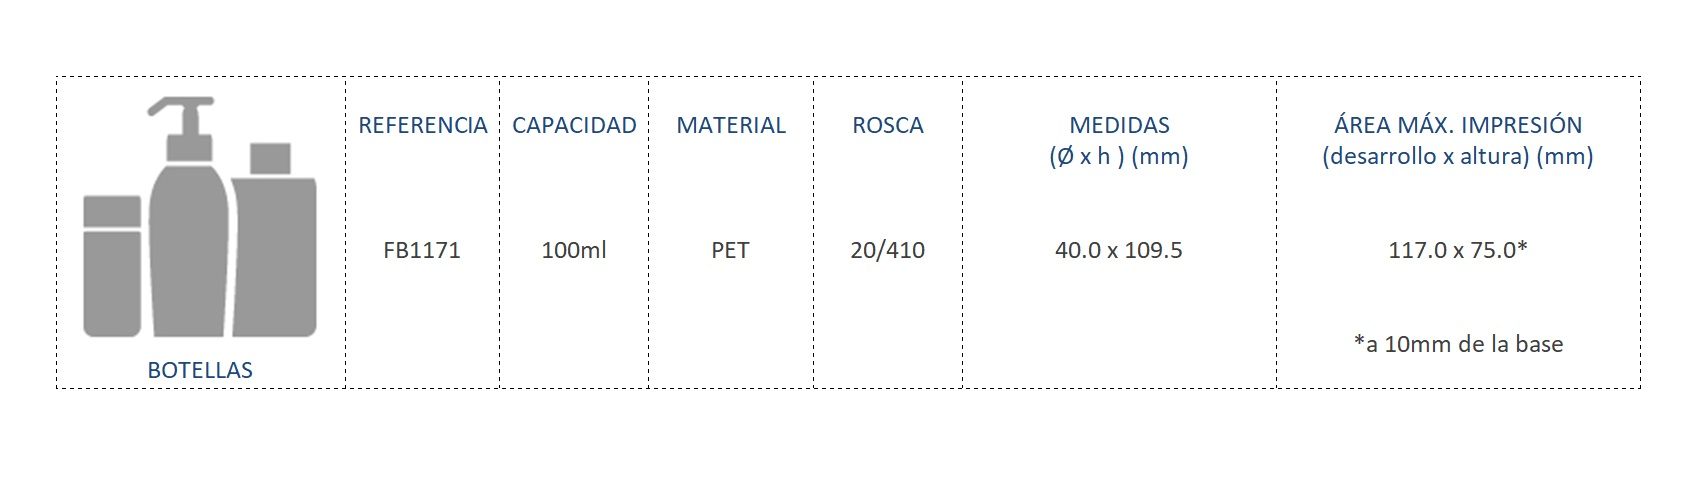 Cuadro de materiales FB1171